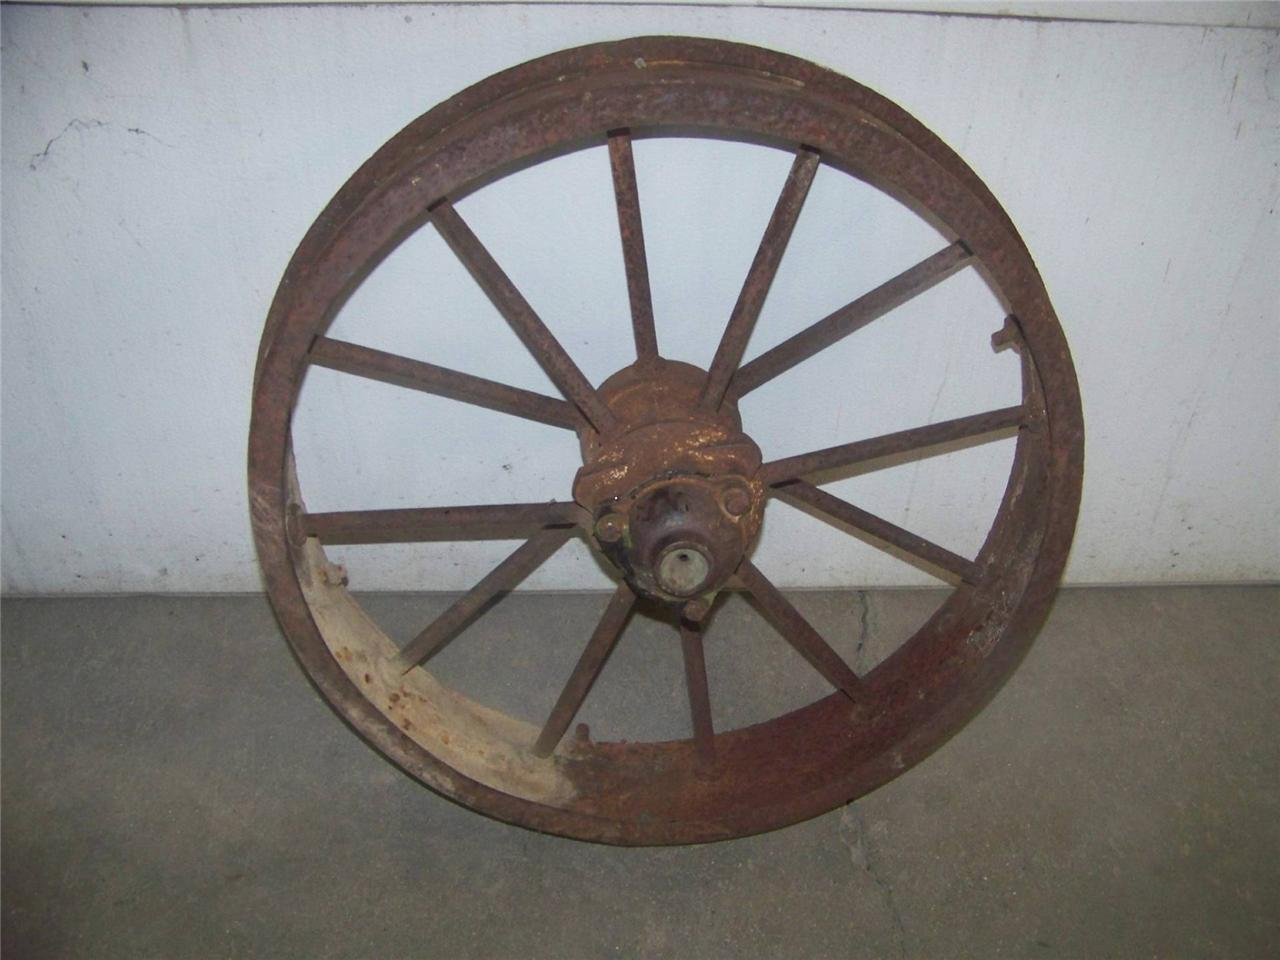 Deere Tractors On Steel Wheels : John deere gp tractor original used take off front steel